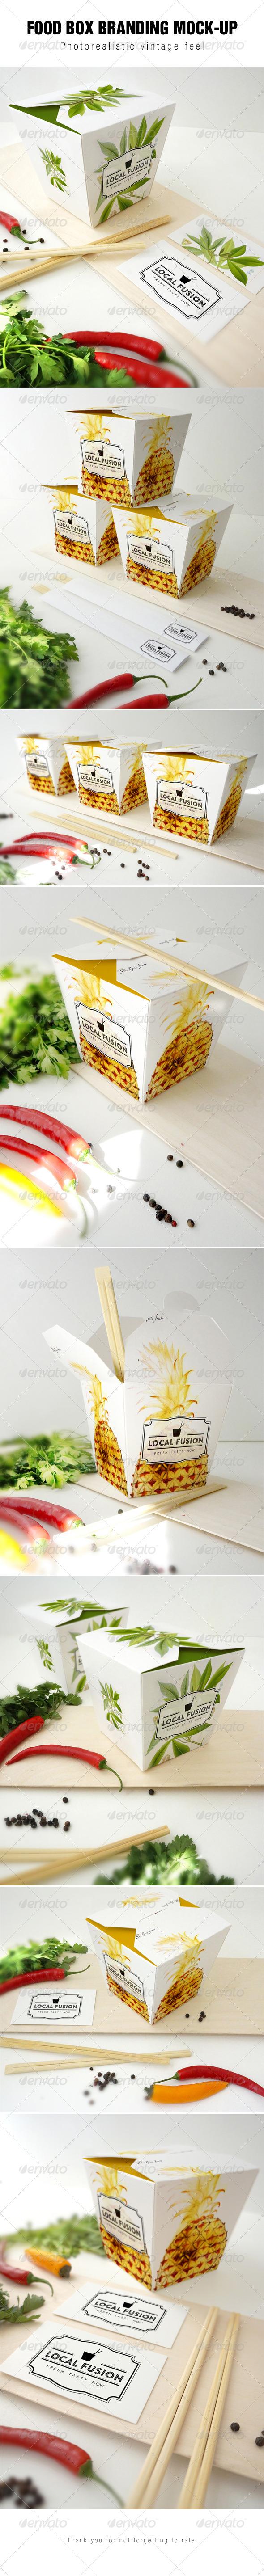 GraphicRiver Food Box Branding Mockup 7859137